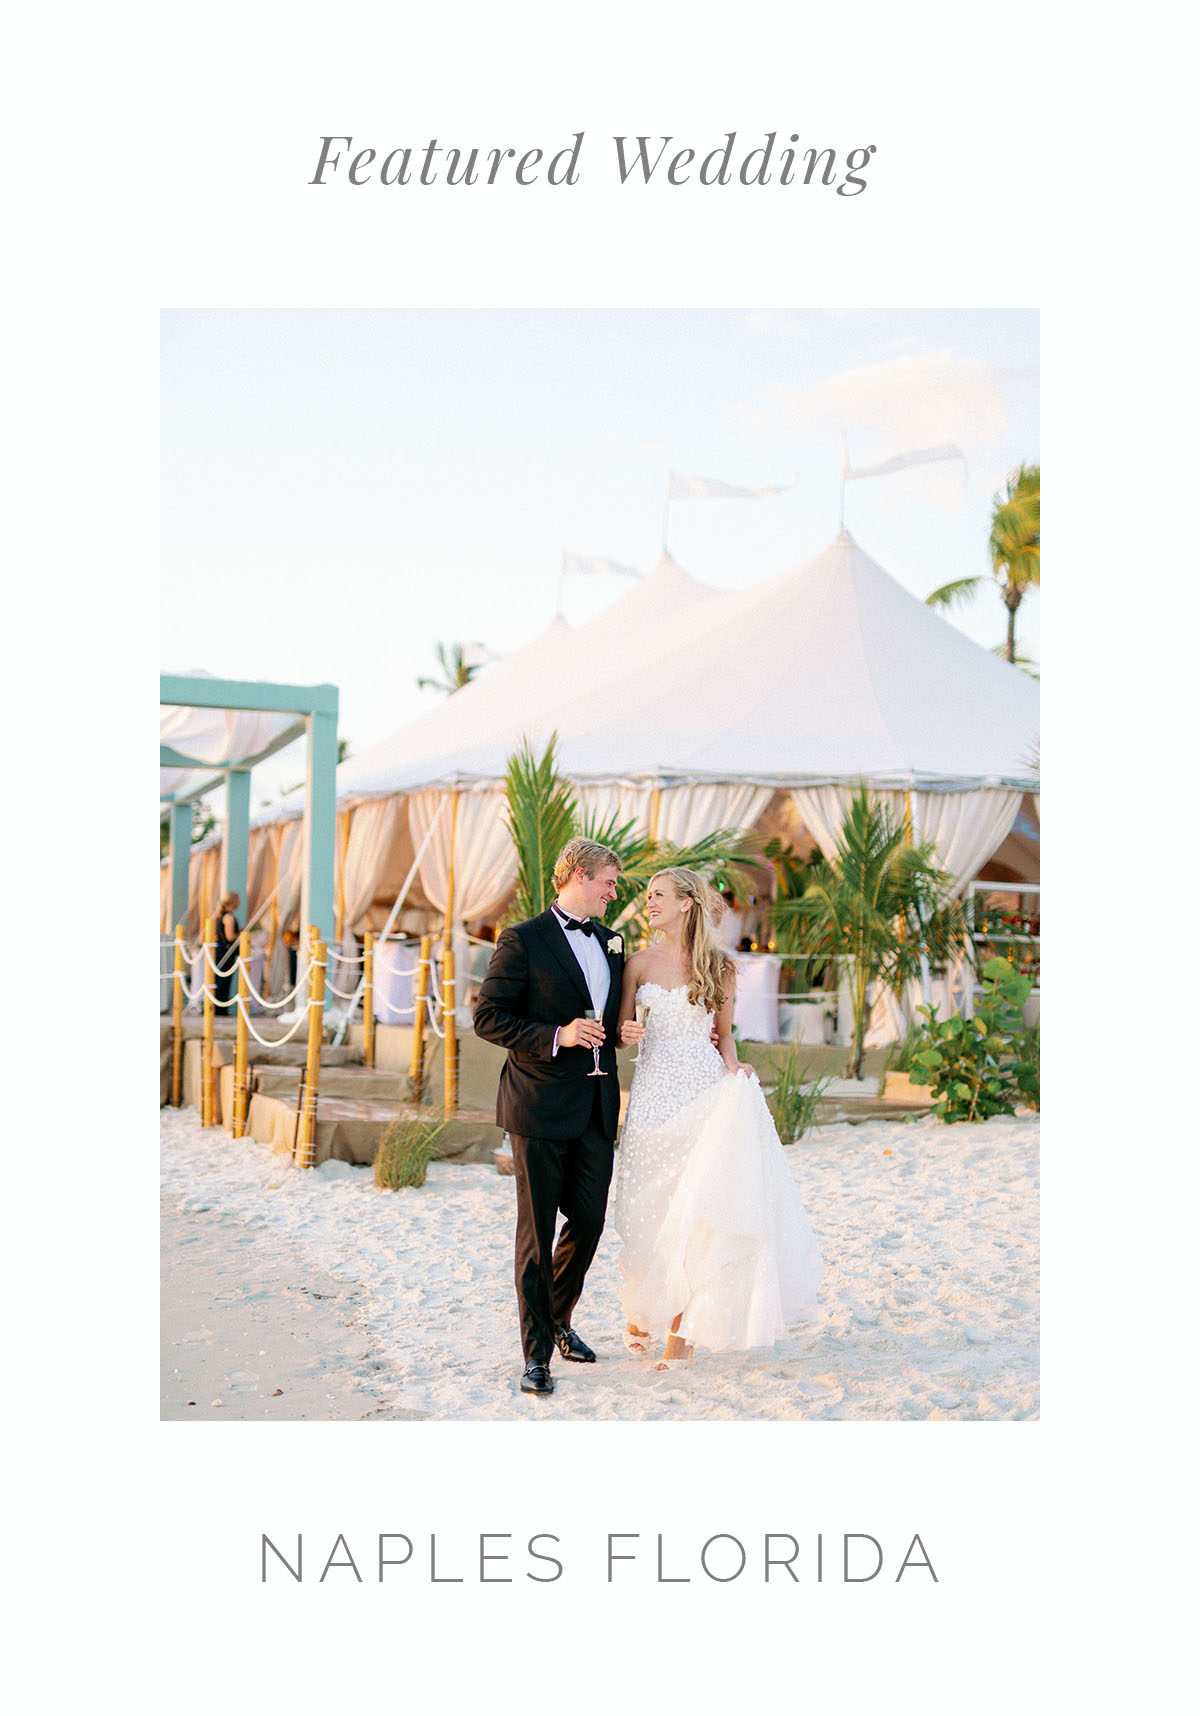 hunter ryan photo - featured wedding port royal club naples florida 1.jpg